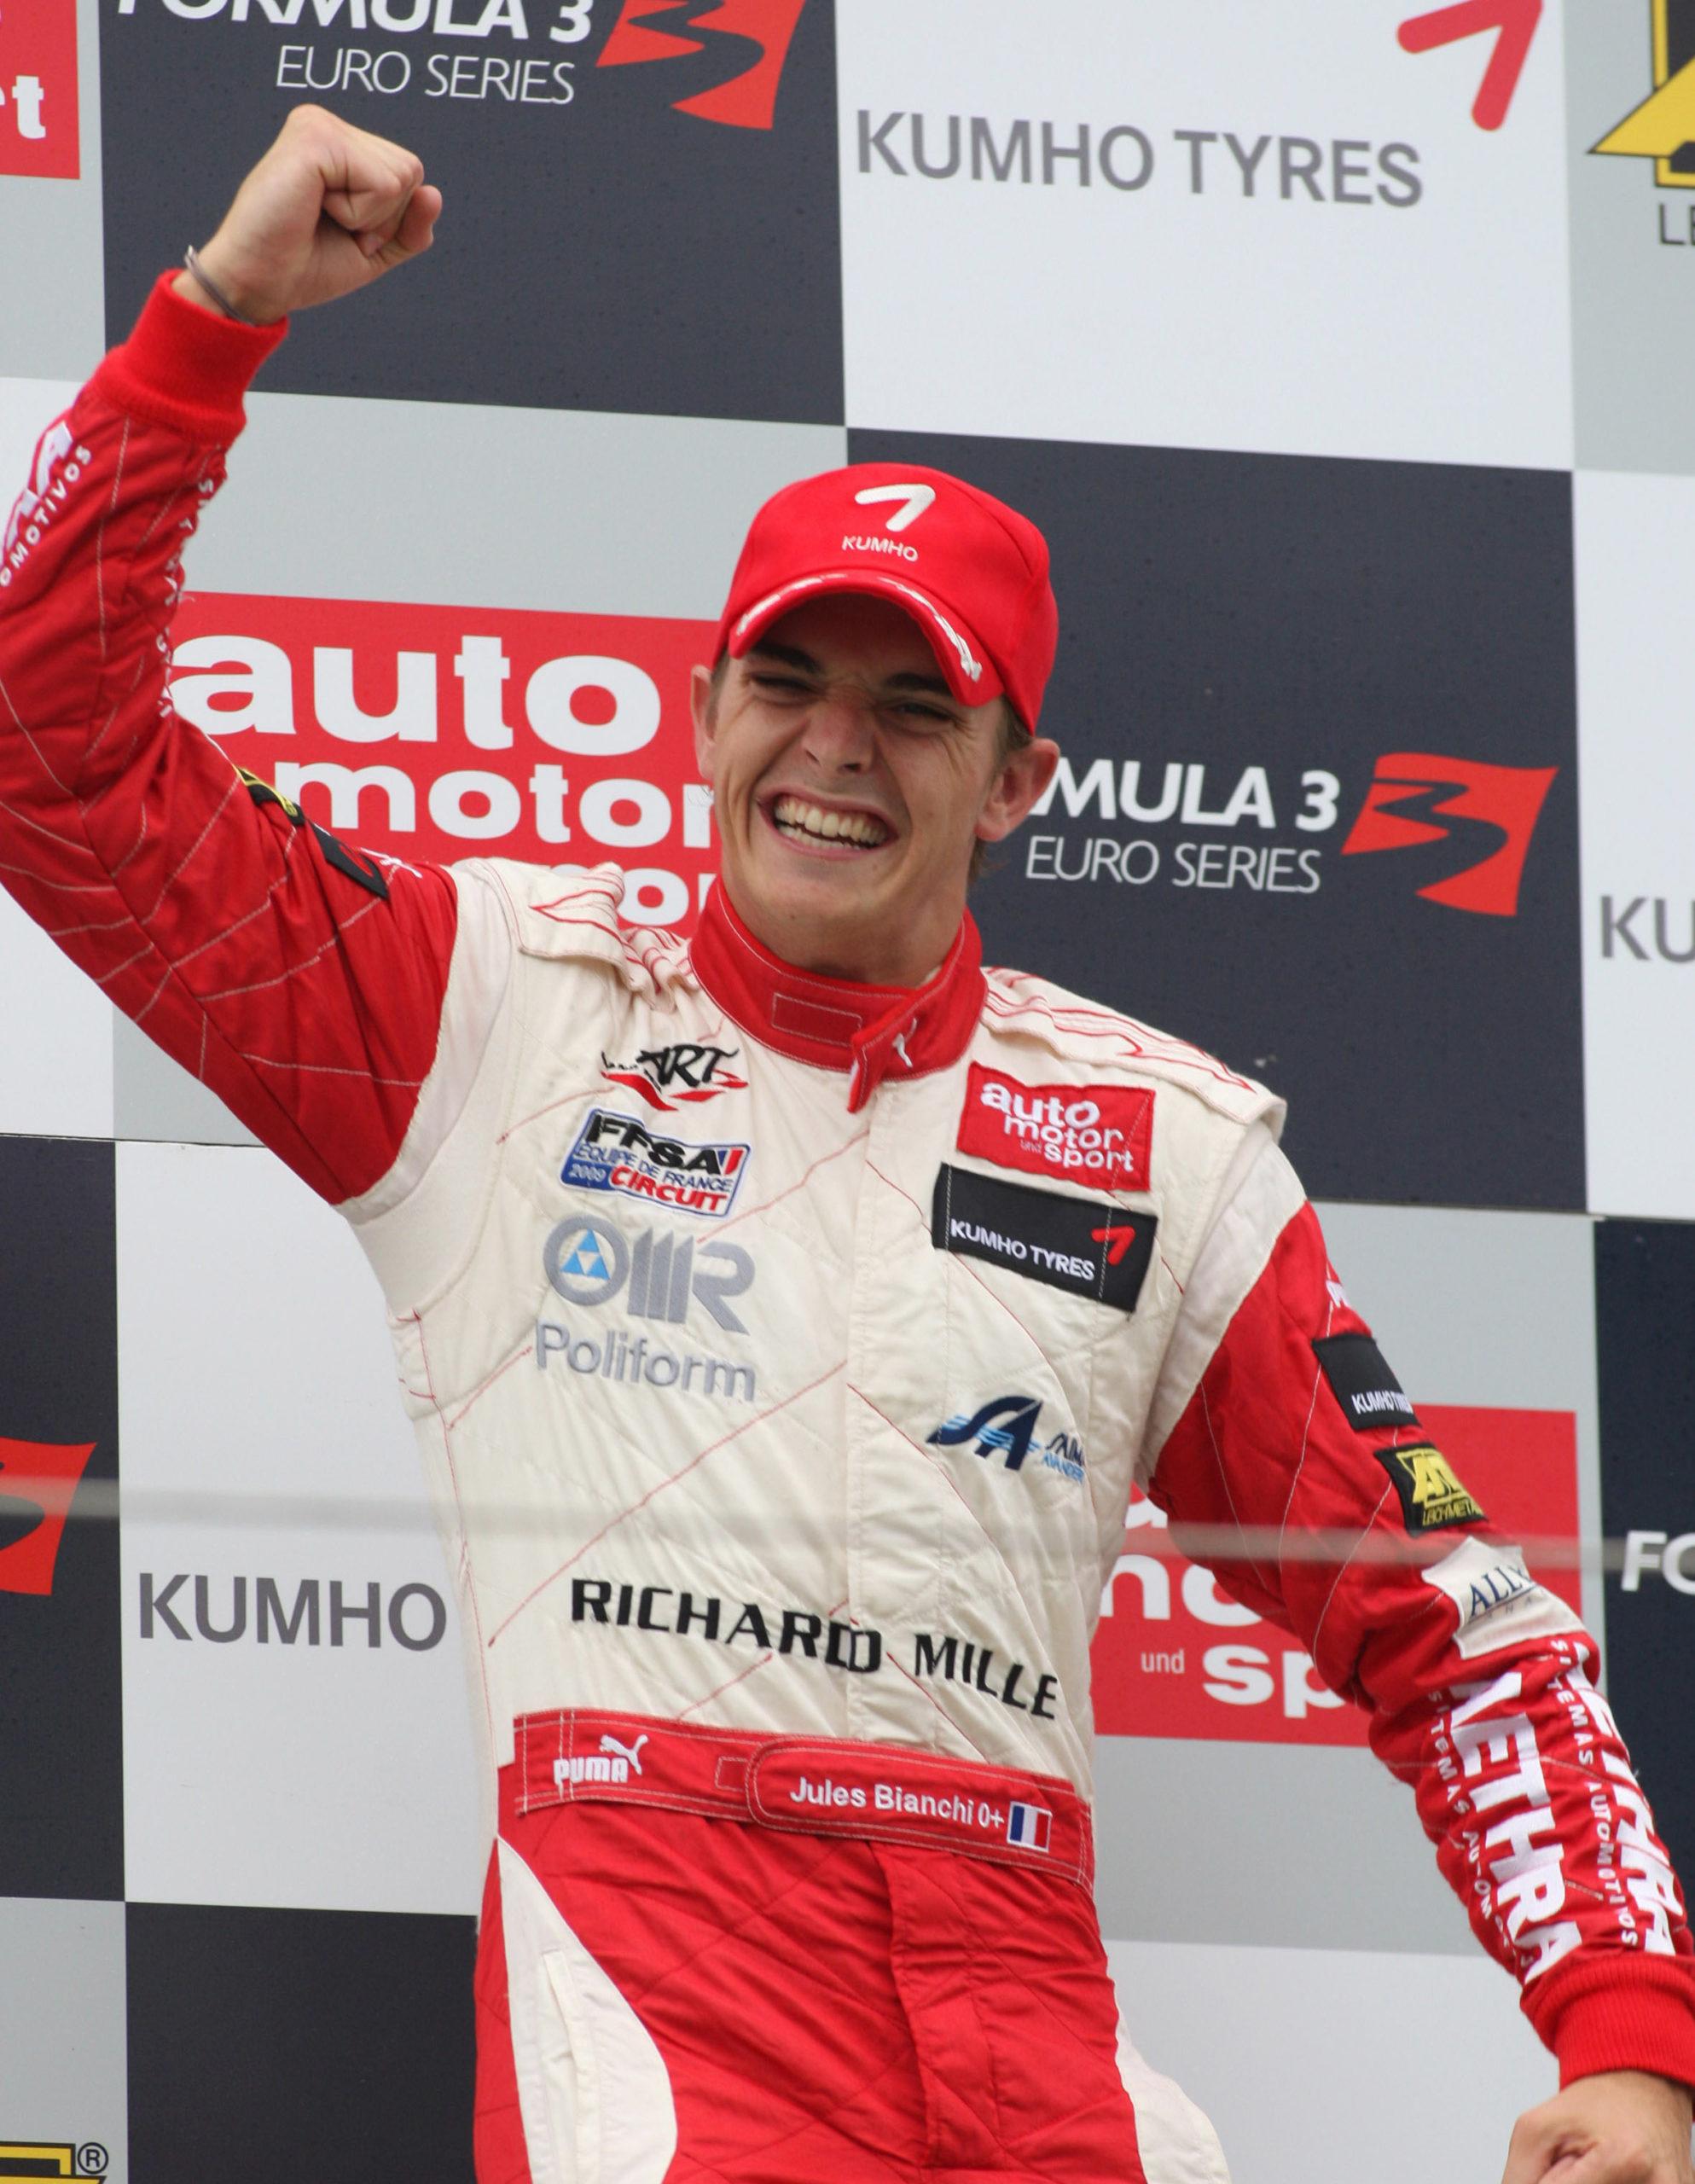 Jules-Bianchi-celbrates-on-the-podium-at-Zandvoort-after-a-European-Formula-3-race